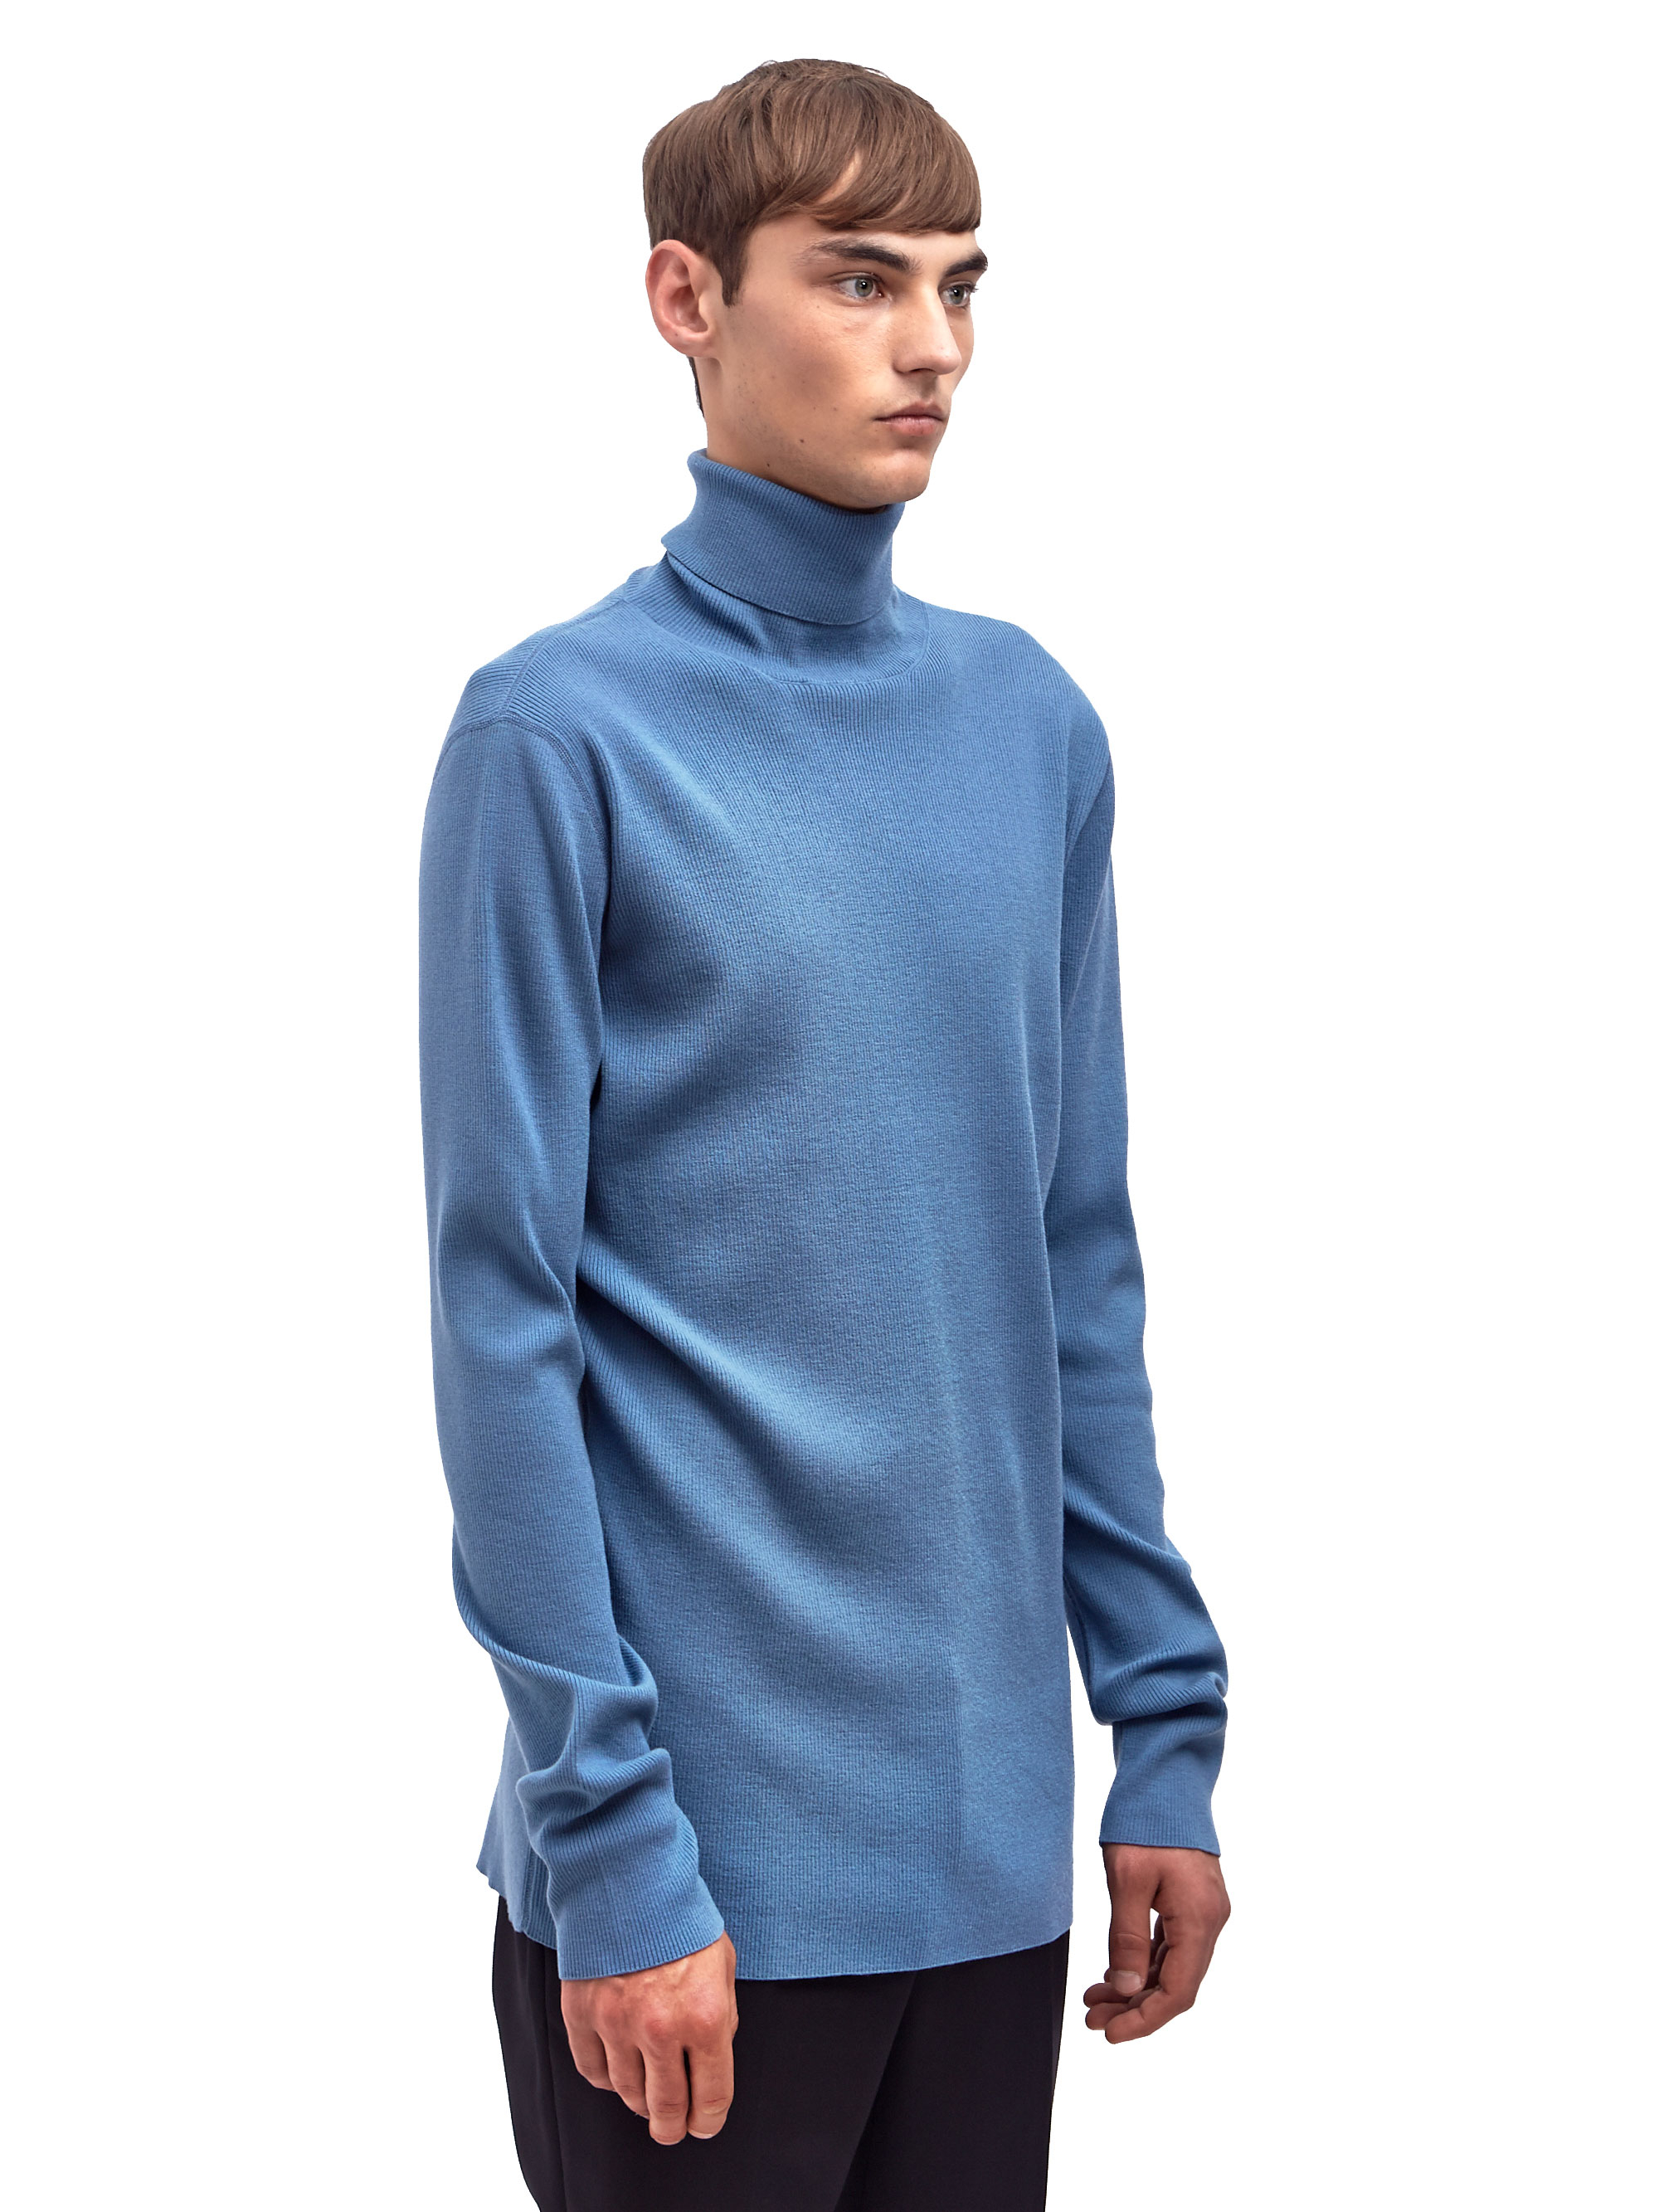 Https Www Lyst Com Clothing Lanvin Mens Rib Stitch Turtle Neck Sweater Blue 1